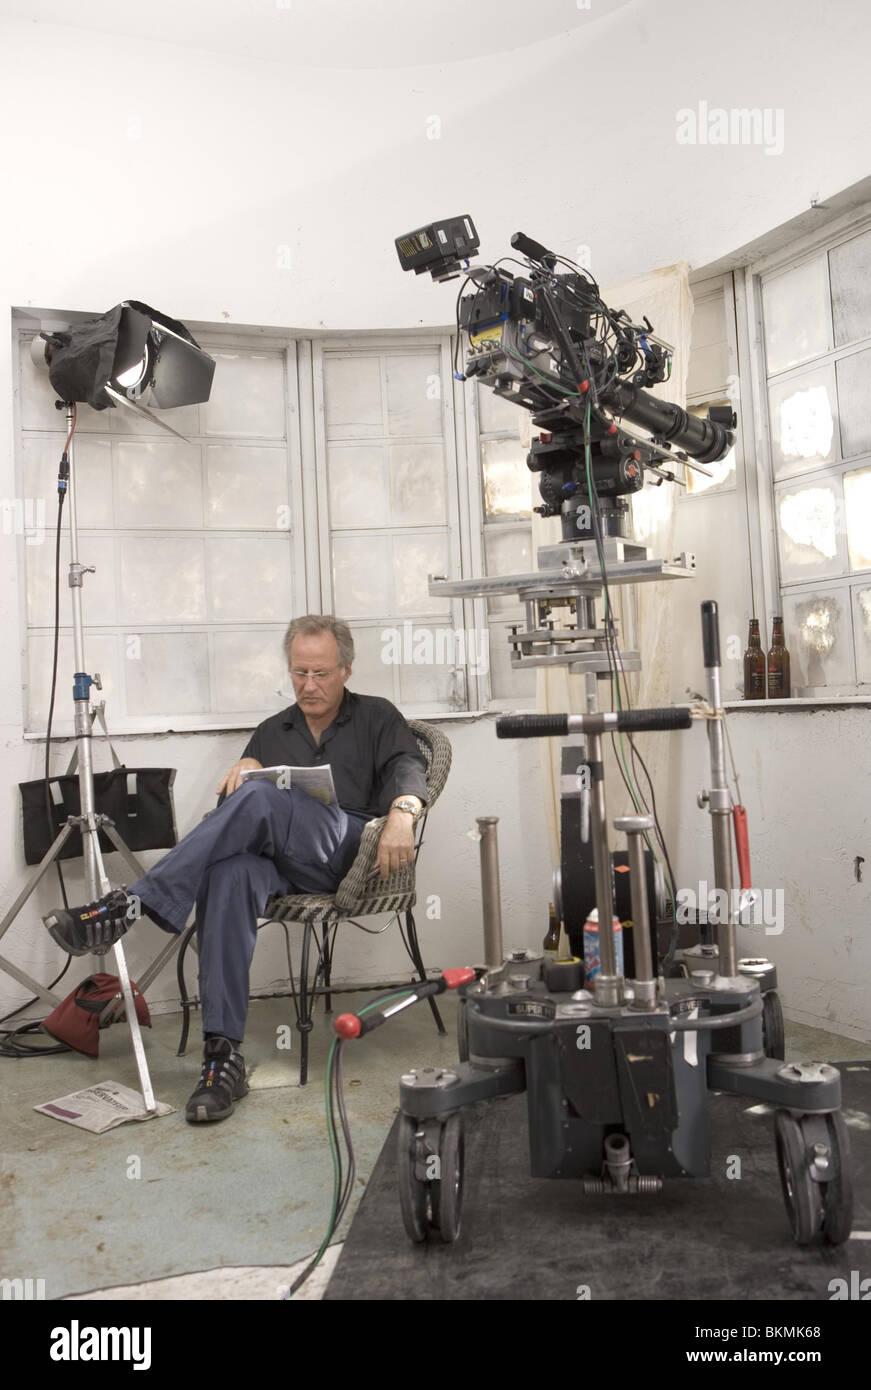 ON SET (ALT) FILMING (ALT) BEHIND THE SCENES (ALT) O/S 'MIAMI VICE' (2006) MICHAEL MANN (DIR) MIMV 001-16 - Stock Image